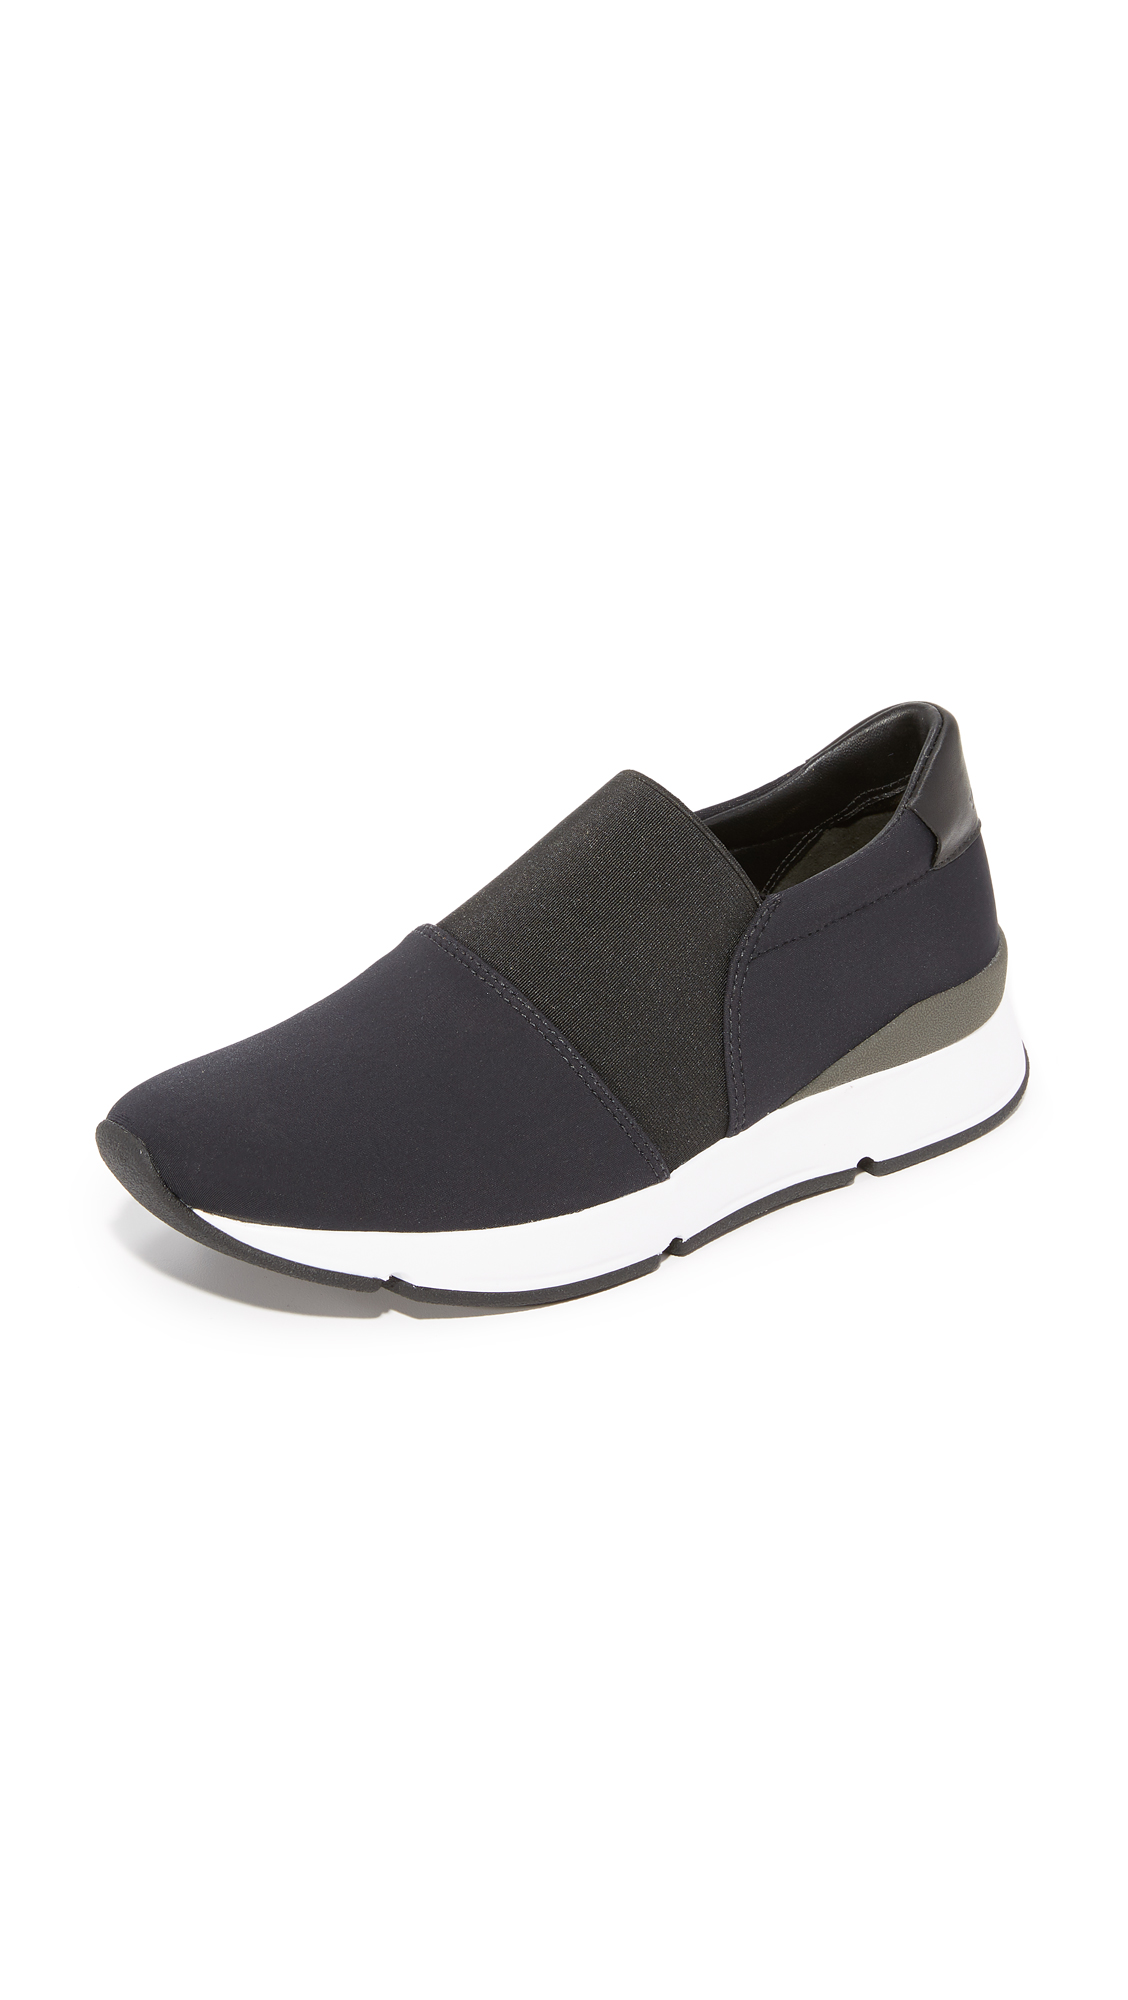 Vince Truscott Jogger Sneakers - Black